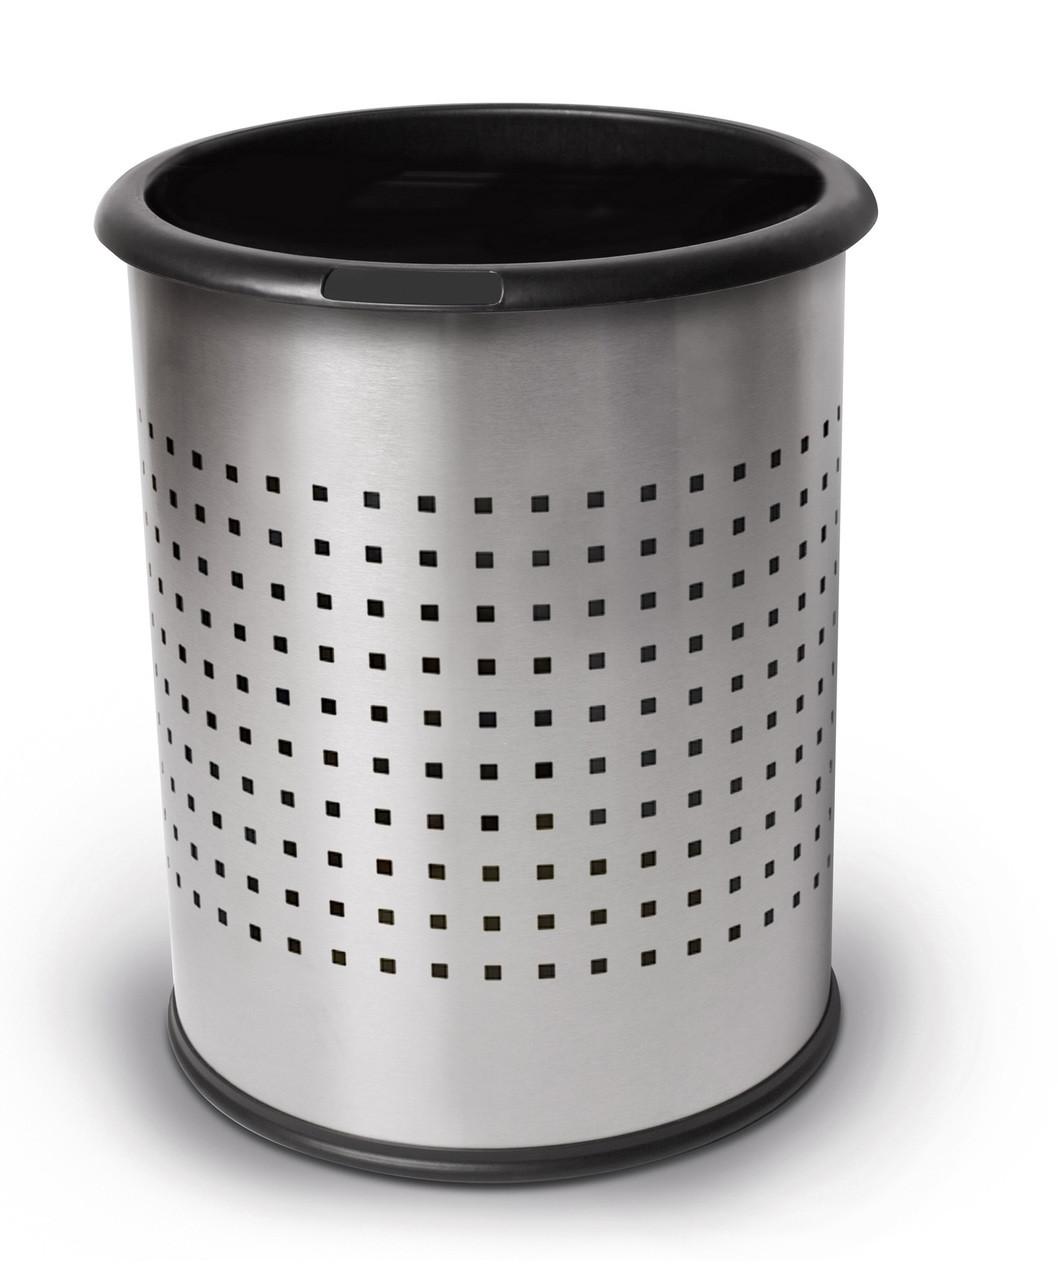 4 Gallon Stainless Steel Wastebasket Perforated Steel 785229